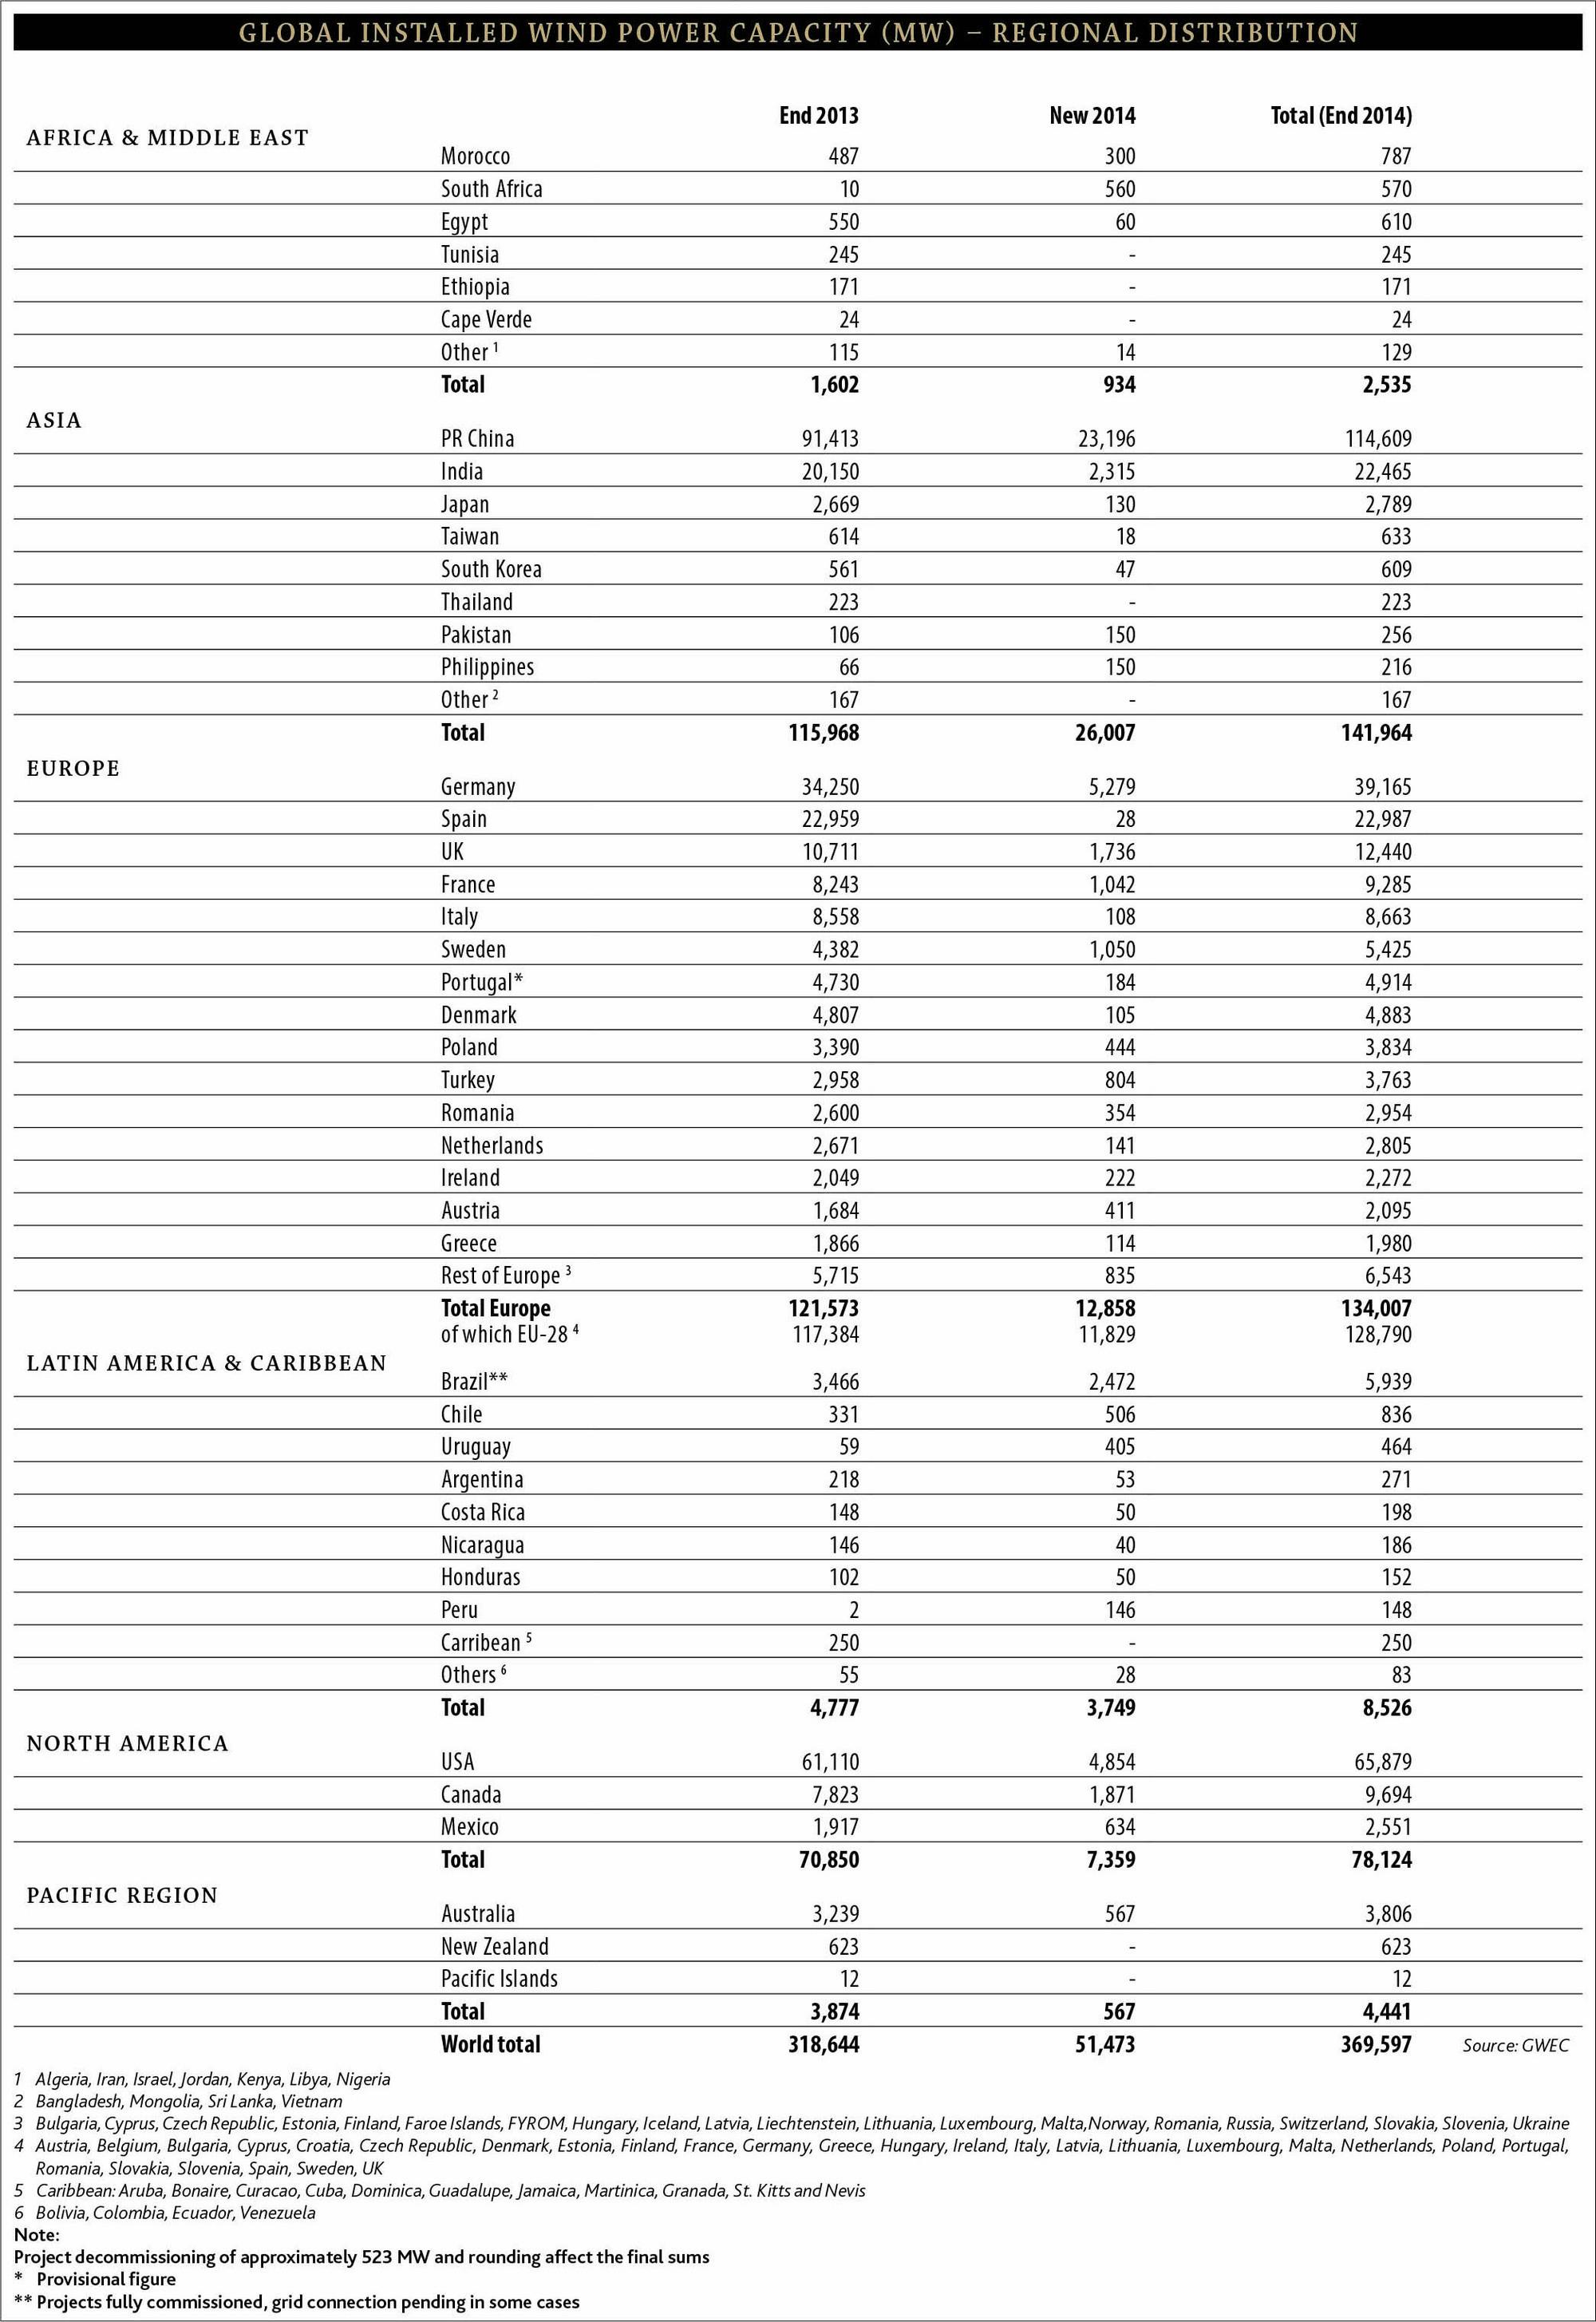 les dessous des cartes - Page 6 GLOBAL_INSTALLED_WIND_POWER_CAPACITY_MW_%E2%80%93_Regional_Distribution